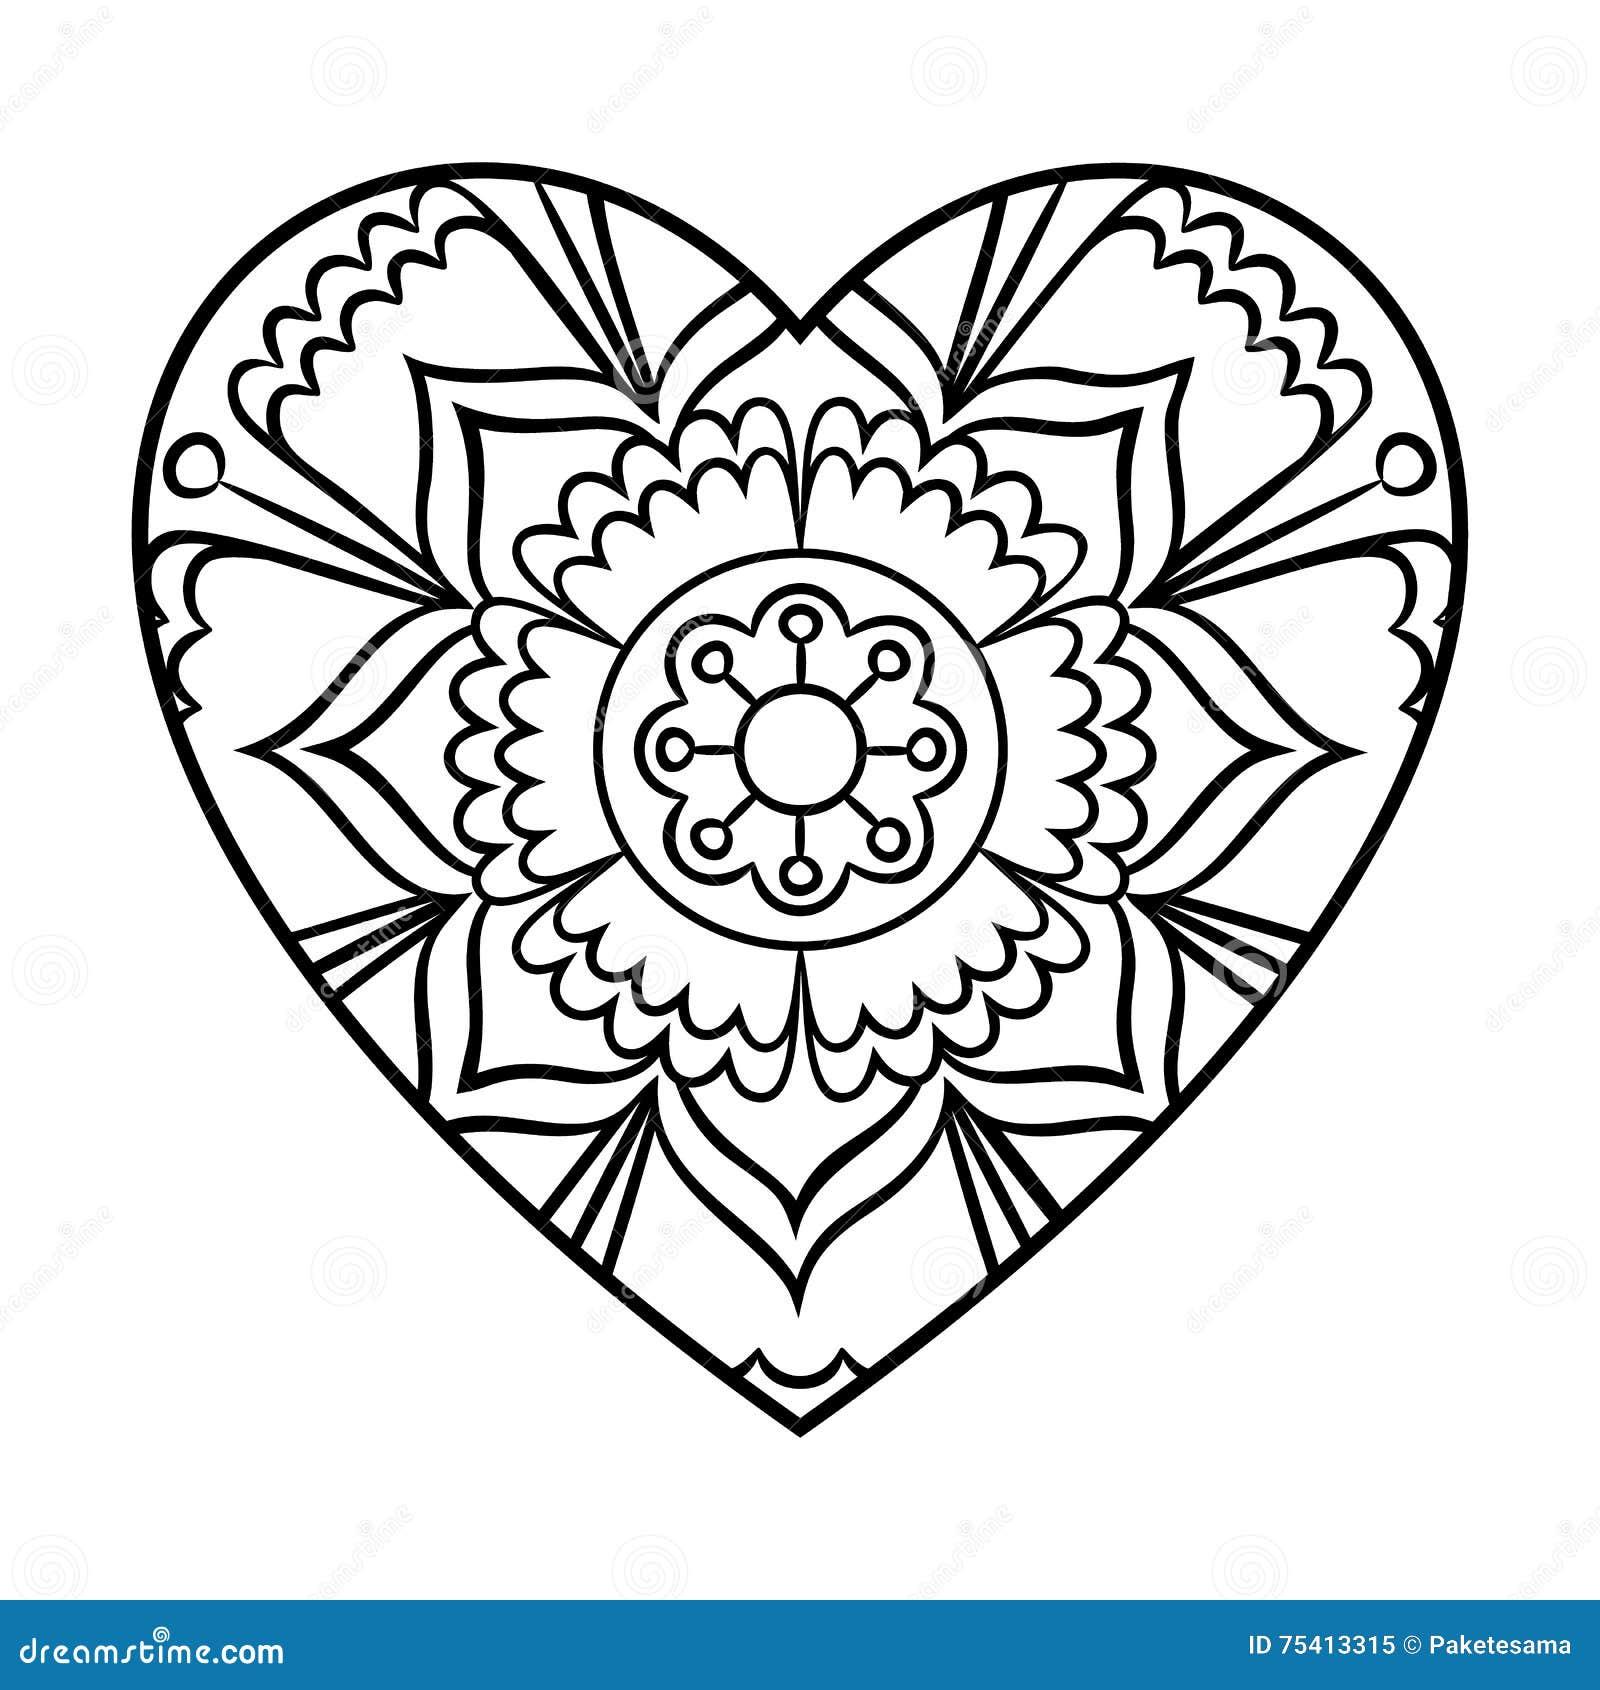 Gekritzel-Herz-Mandala vektor abbildung. Illustration von ...